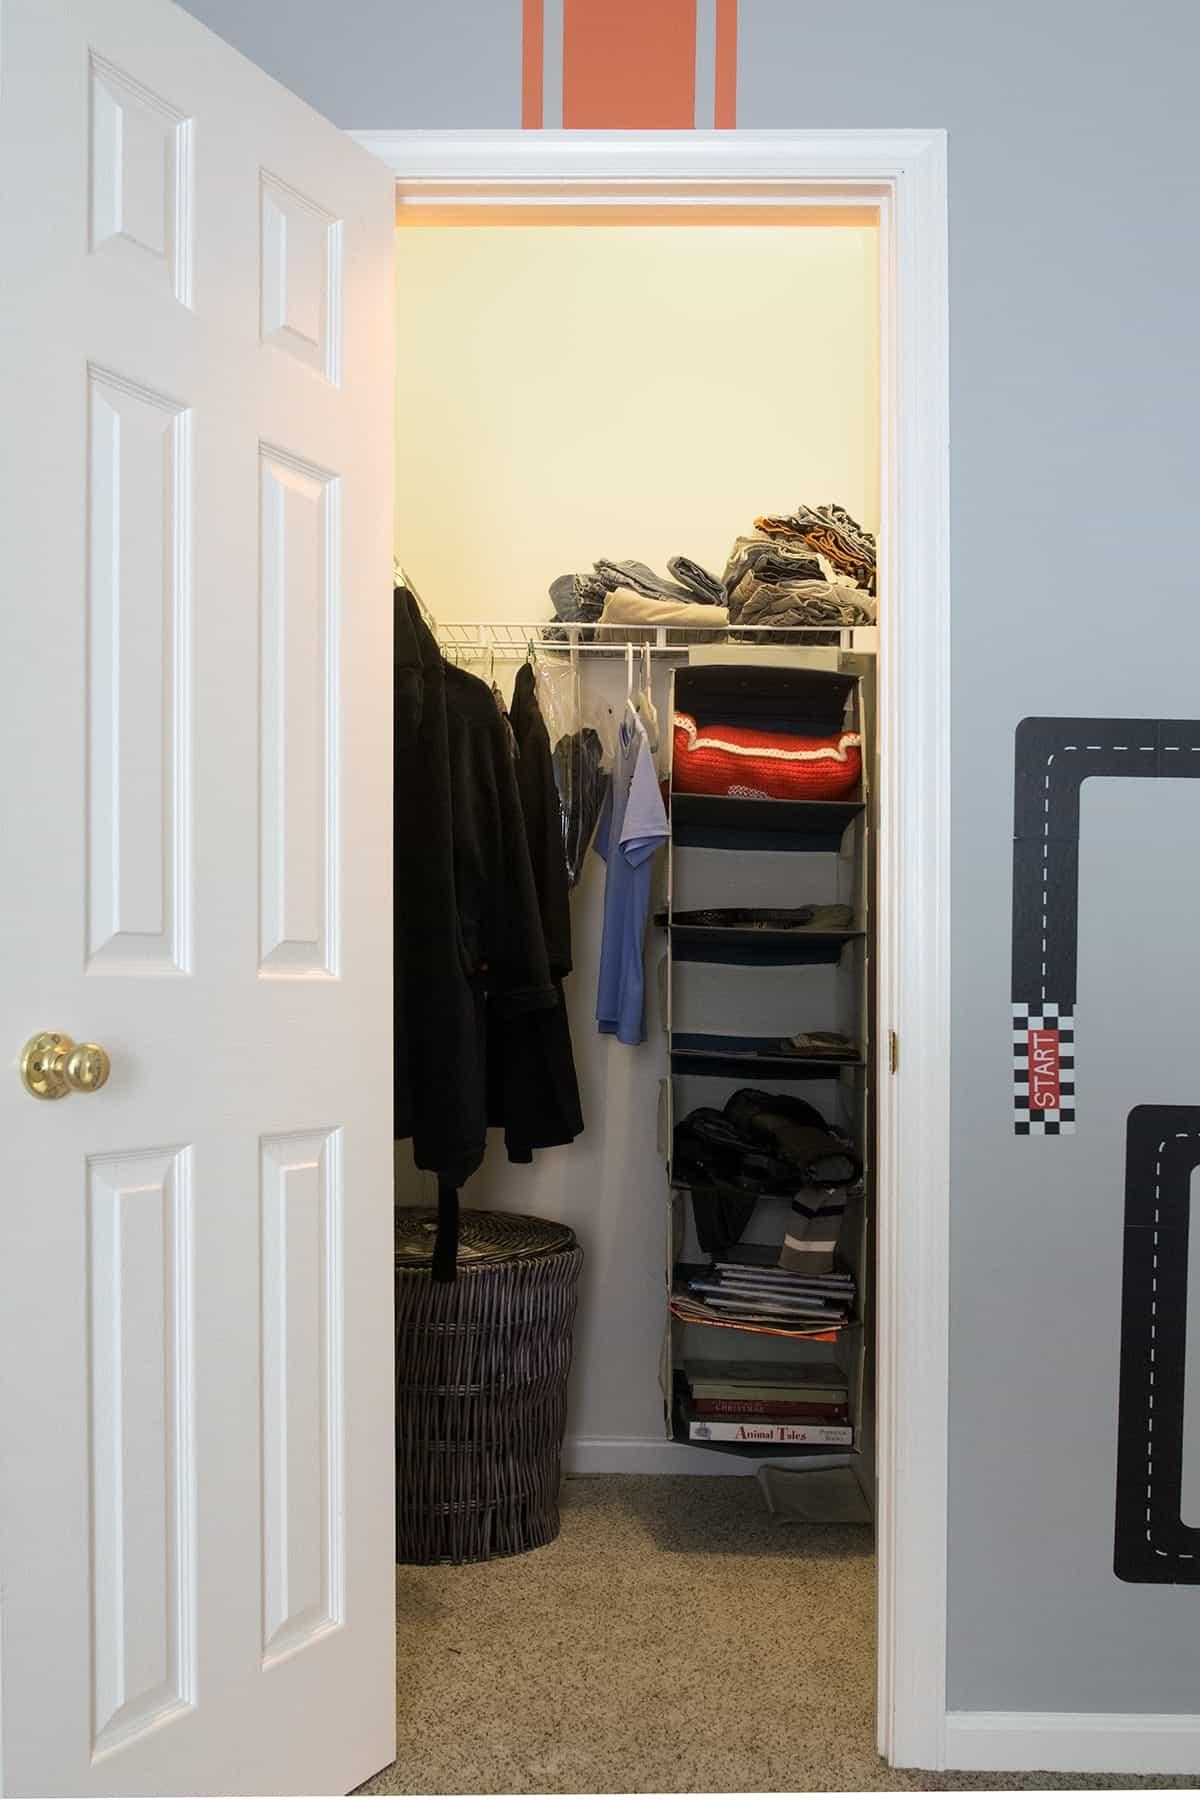 Messy Boys' Closet before organization.